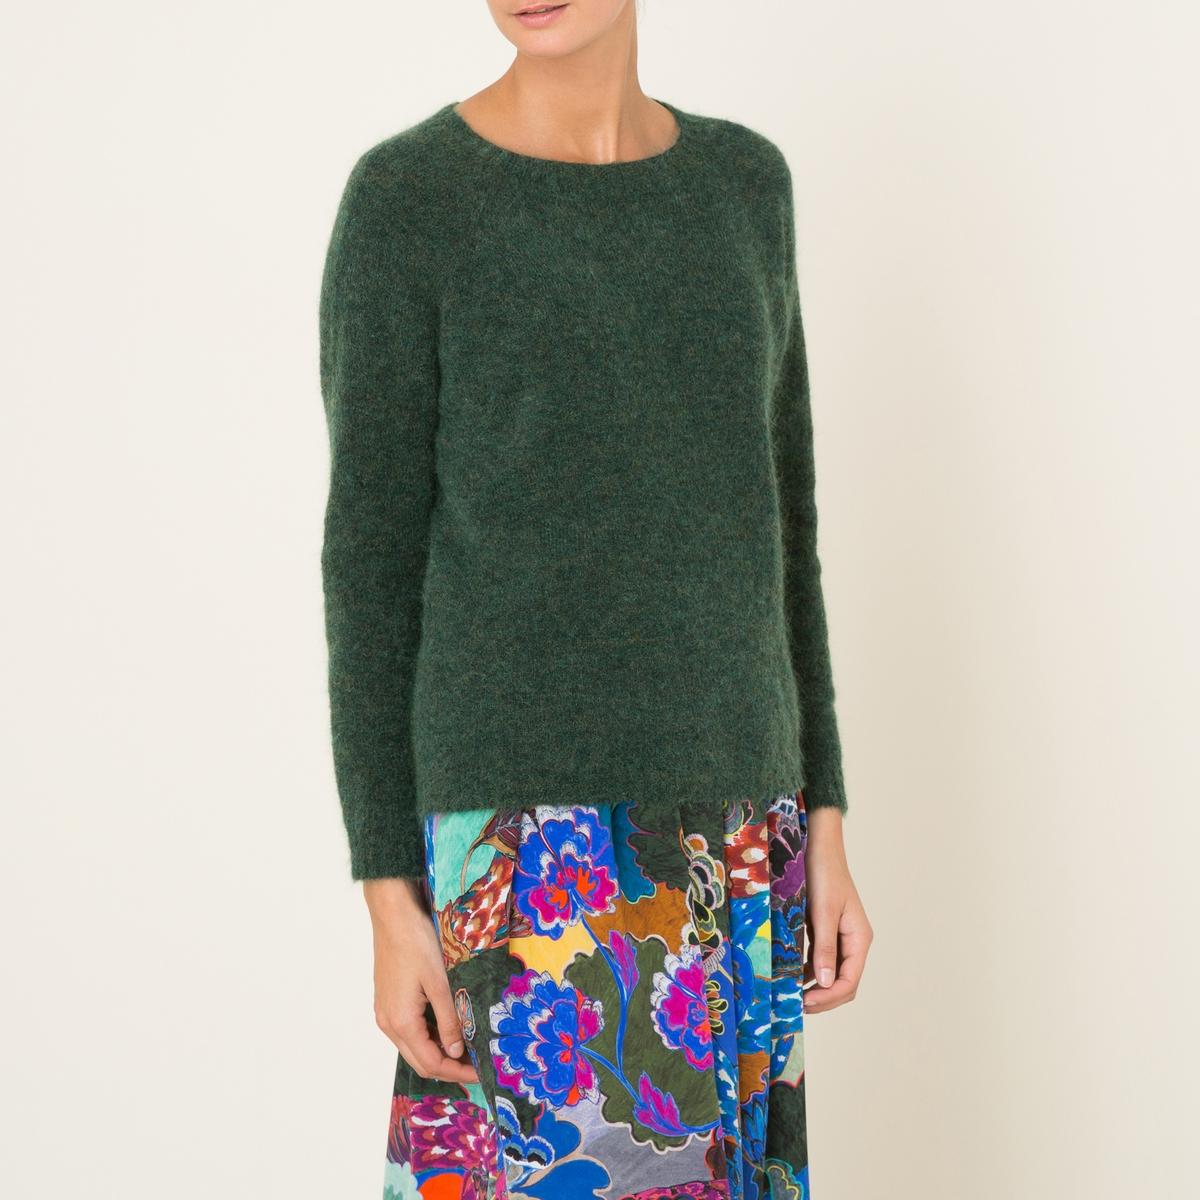 Пуловер OMACATIСостав и описание :Материал : 35% мохера, 35% шерсти, 27% полиамида, 3% эластанаМарка : MOMONI<br><br>Цвет: зеленый